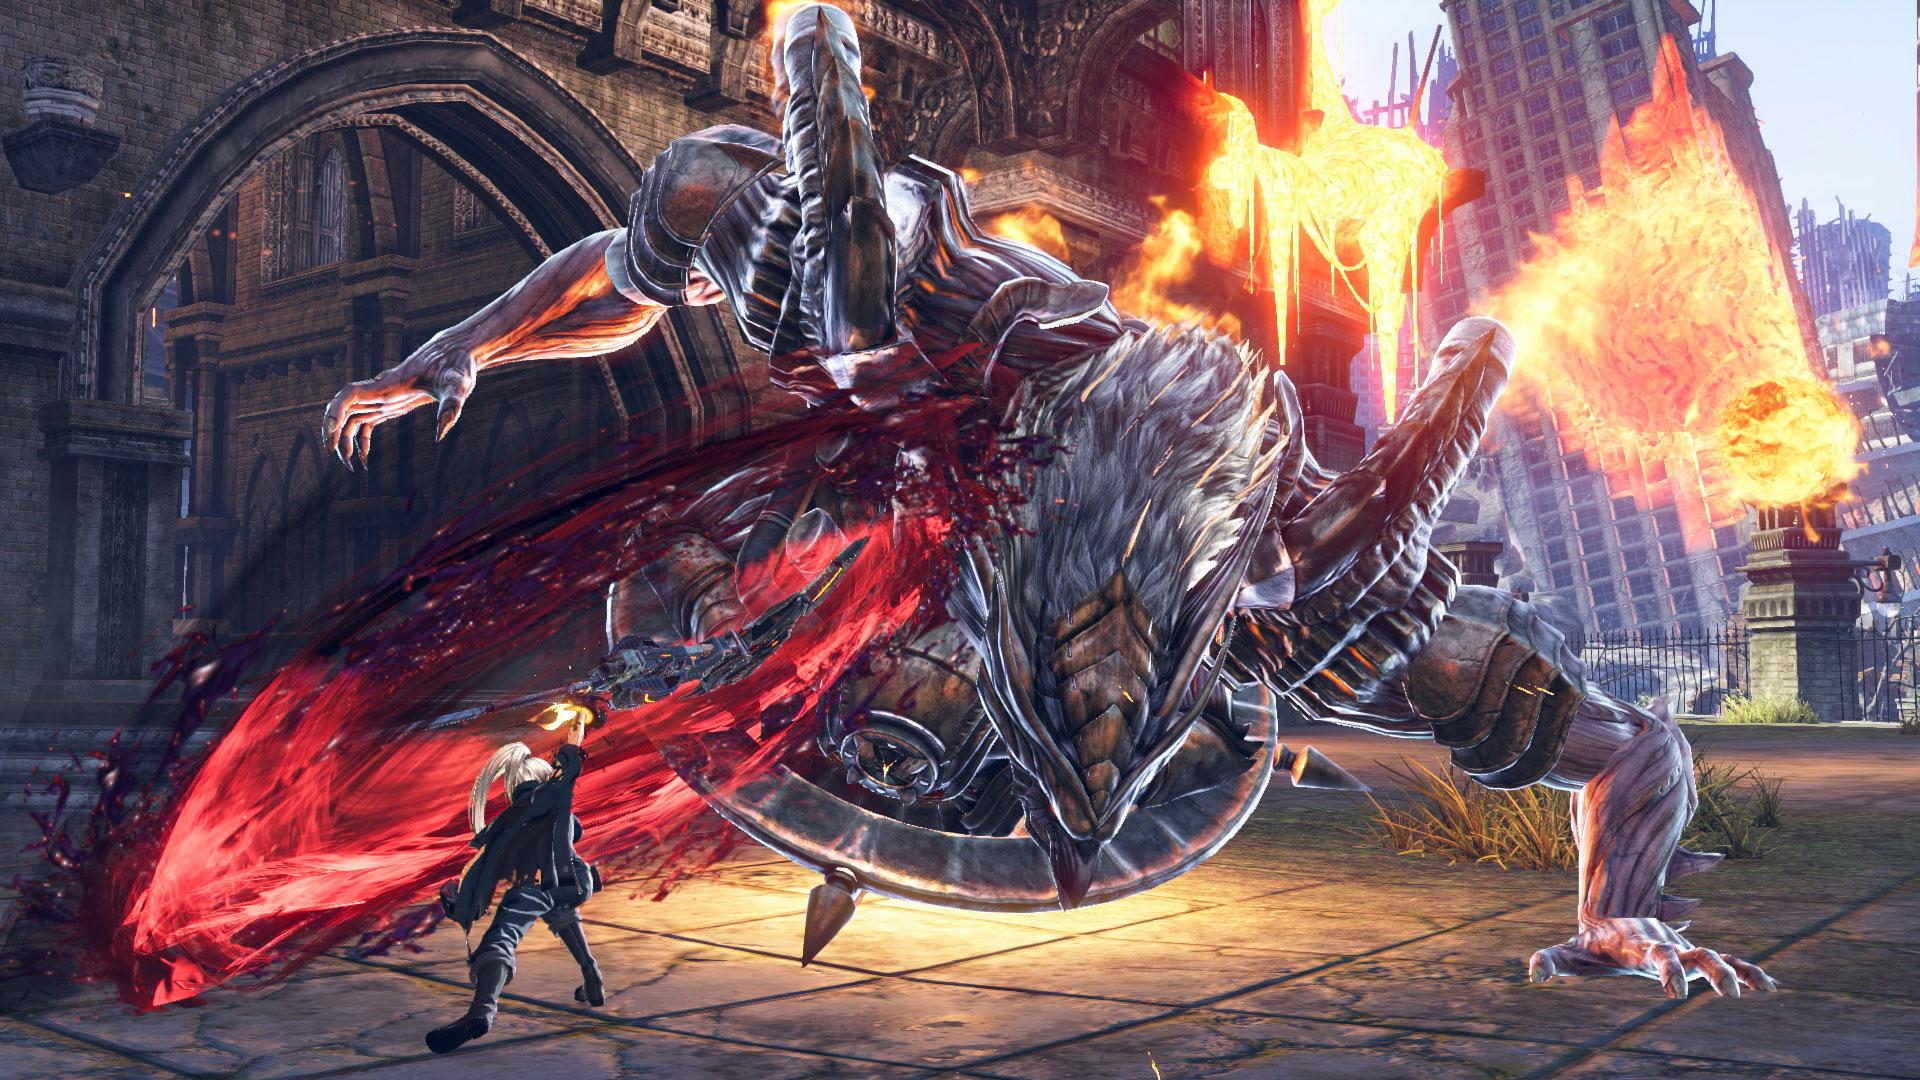 Mortal Kombat X Wallpapers Hd Iphone God Eater 3 Wallpapers In Ultra Hd 4k Gameranx